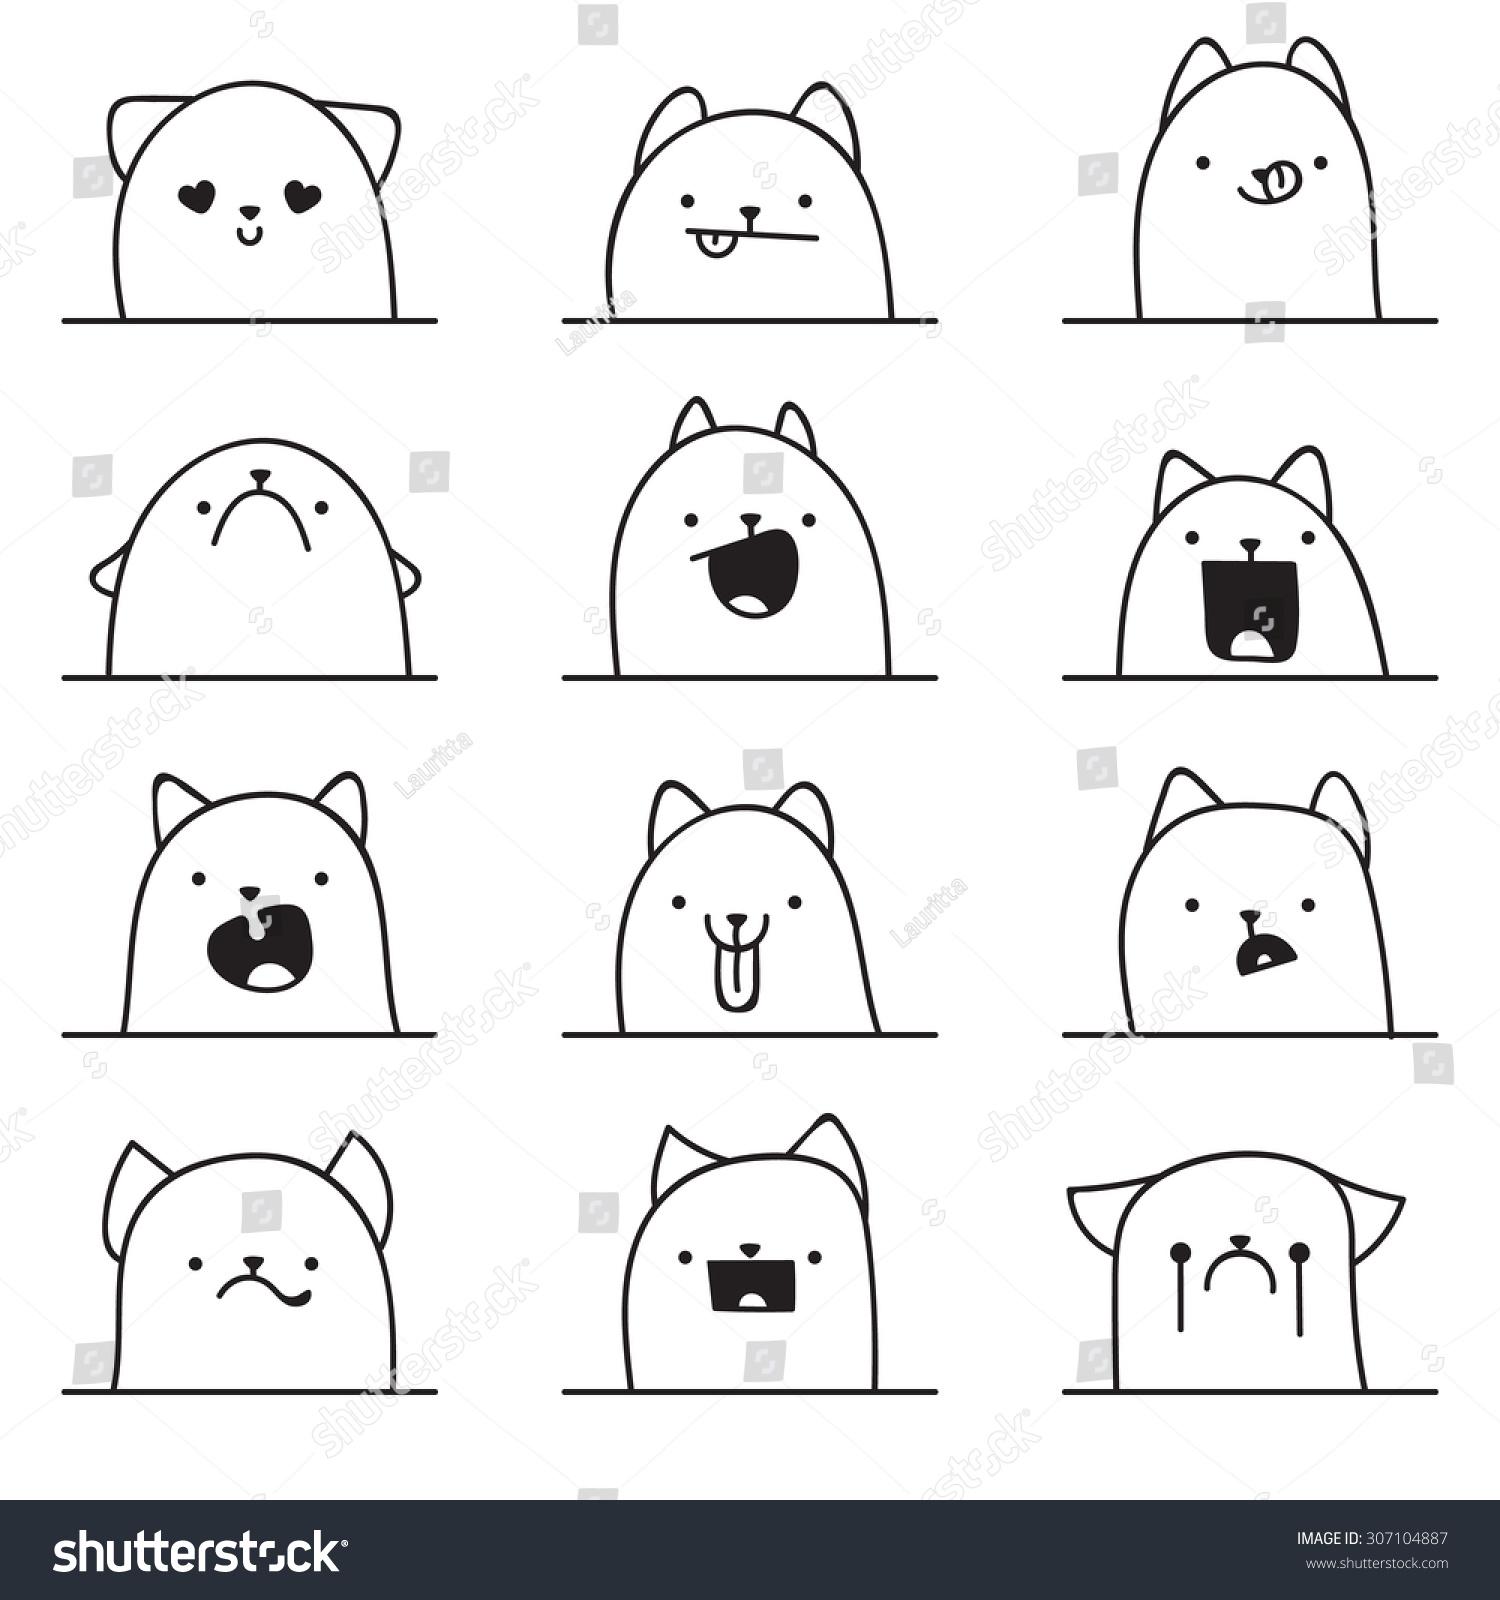 set of 12 different doodle emotions cat emotions for